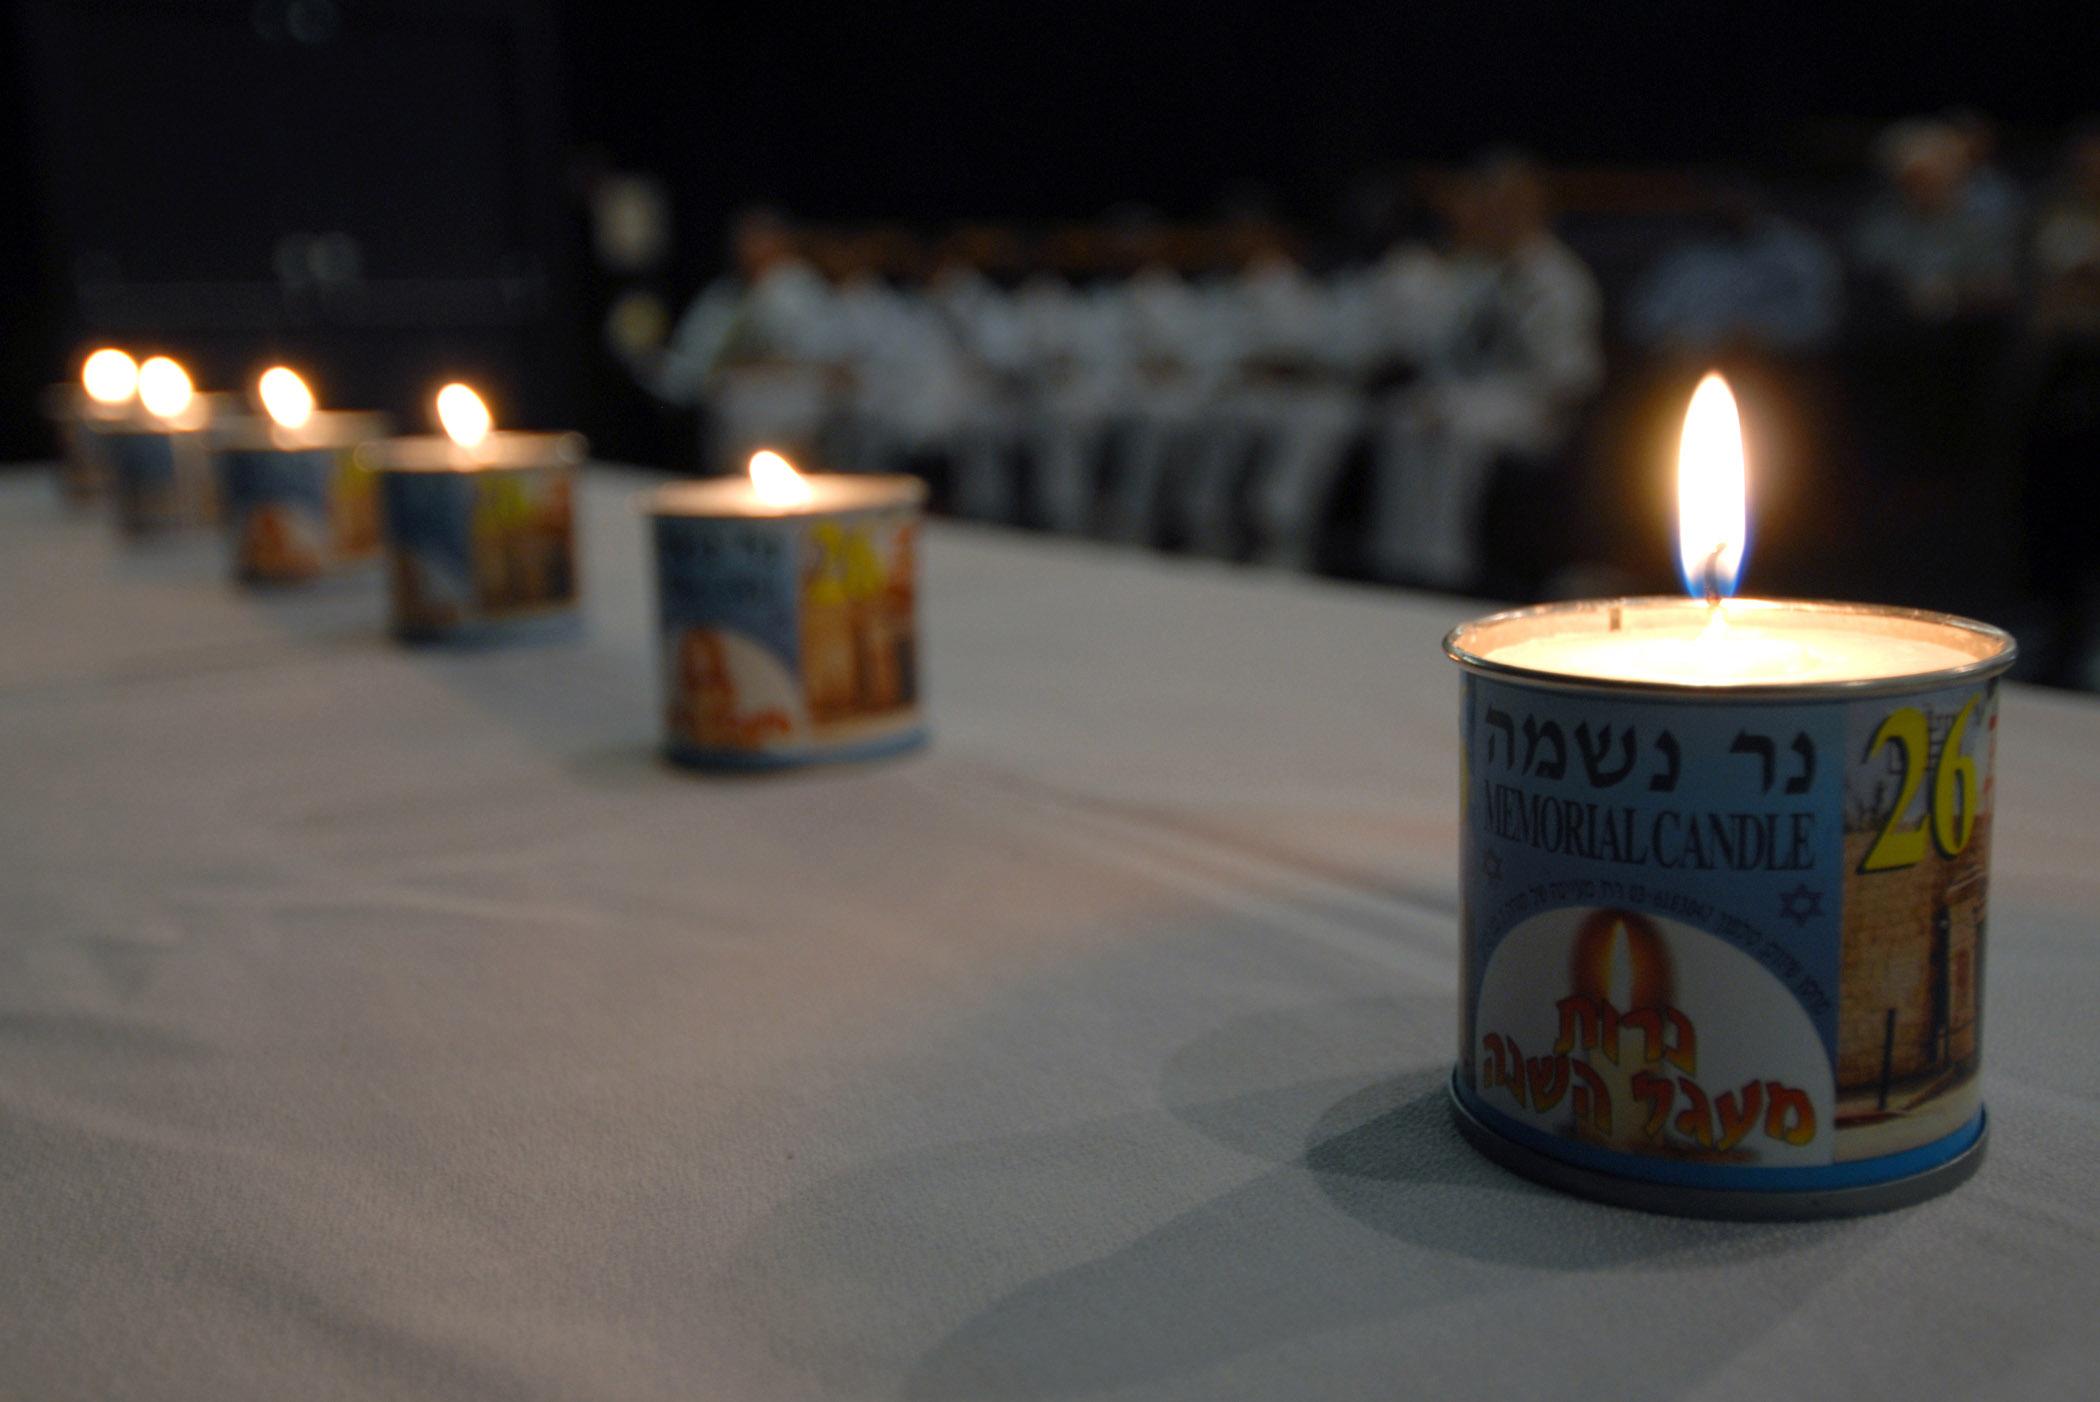 Yahrzeit candle - Wikipedia